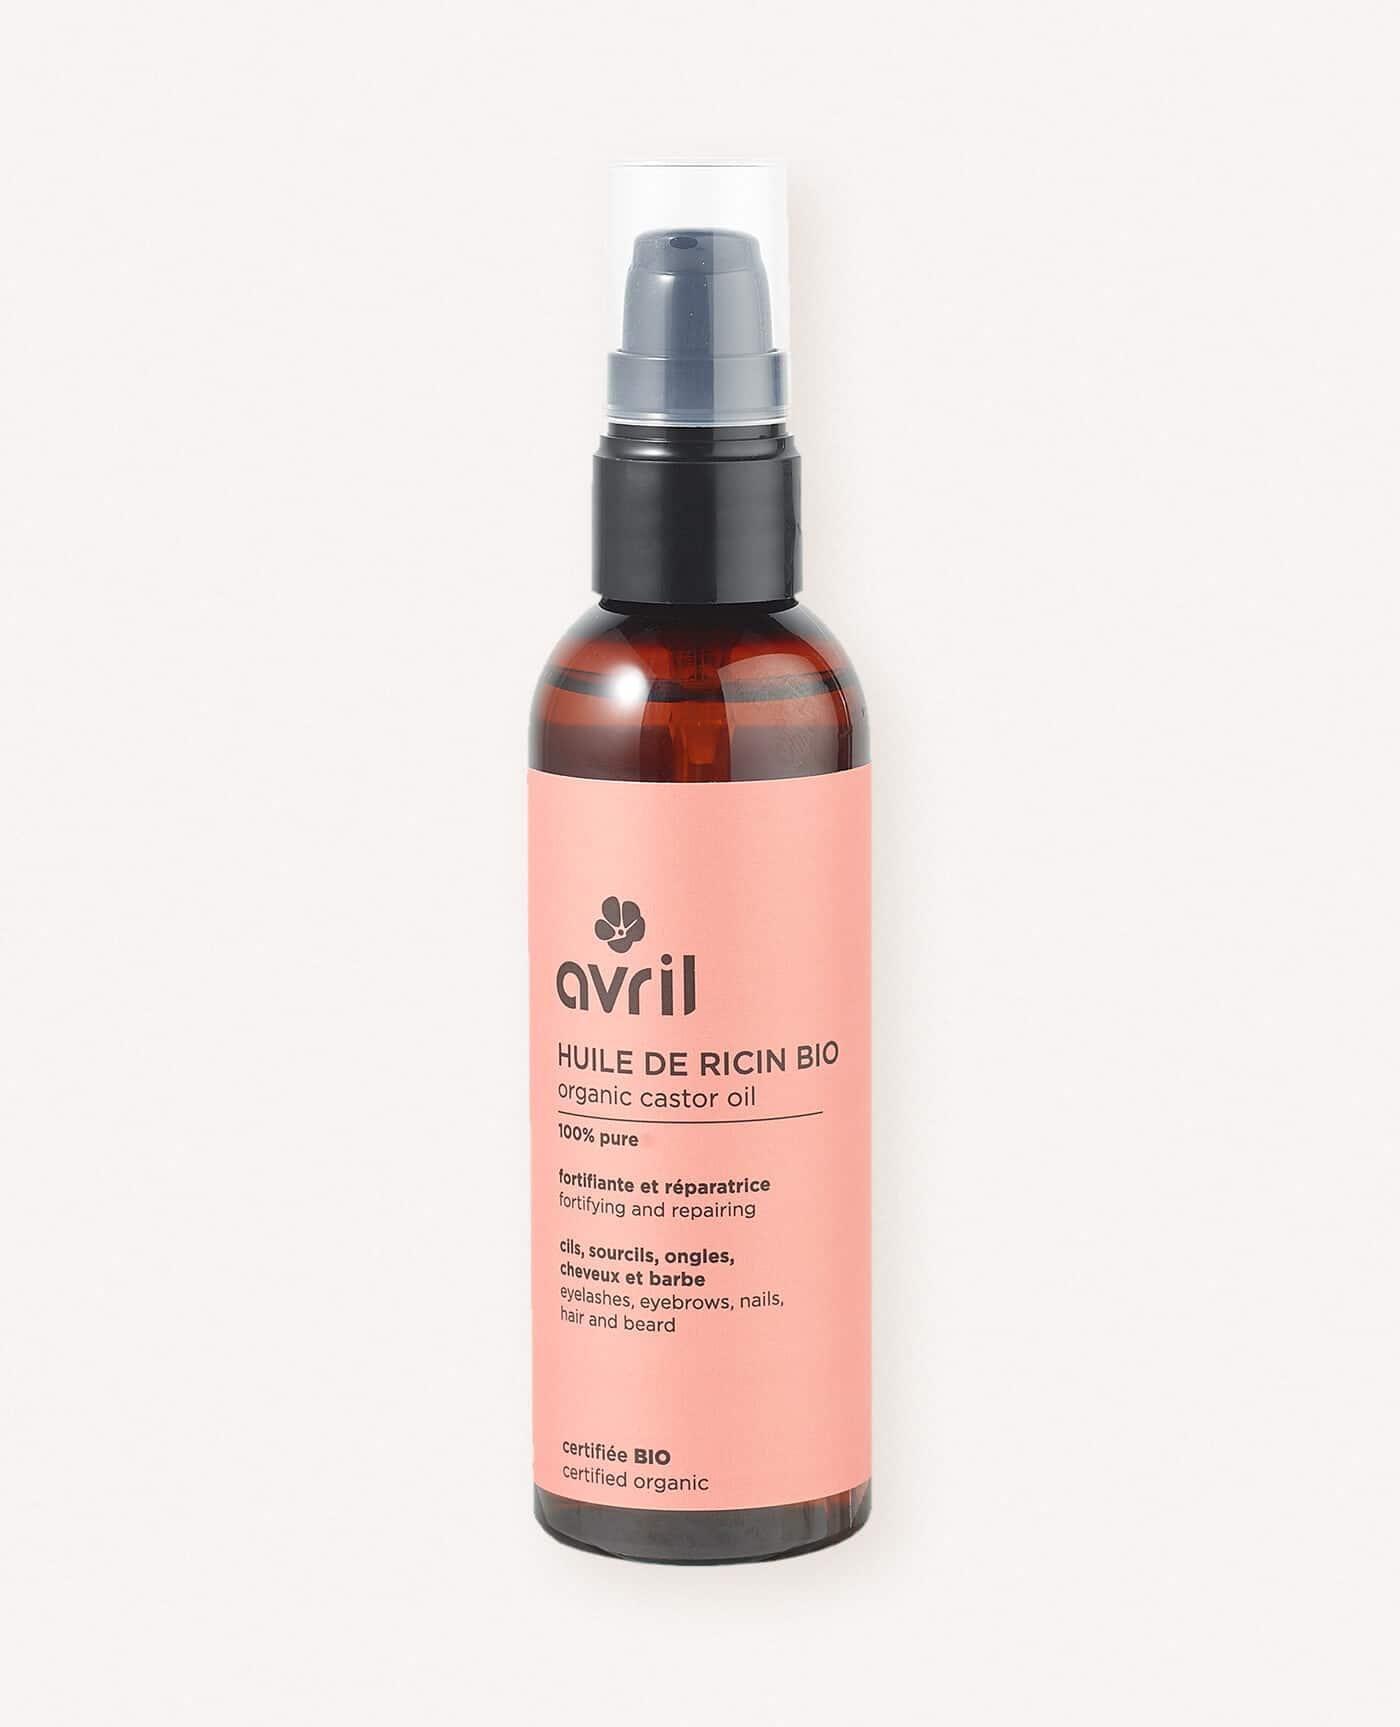 Huile de ricin bio, naturel et vegan de la marque Avril cosmétiques made in France